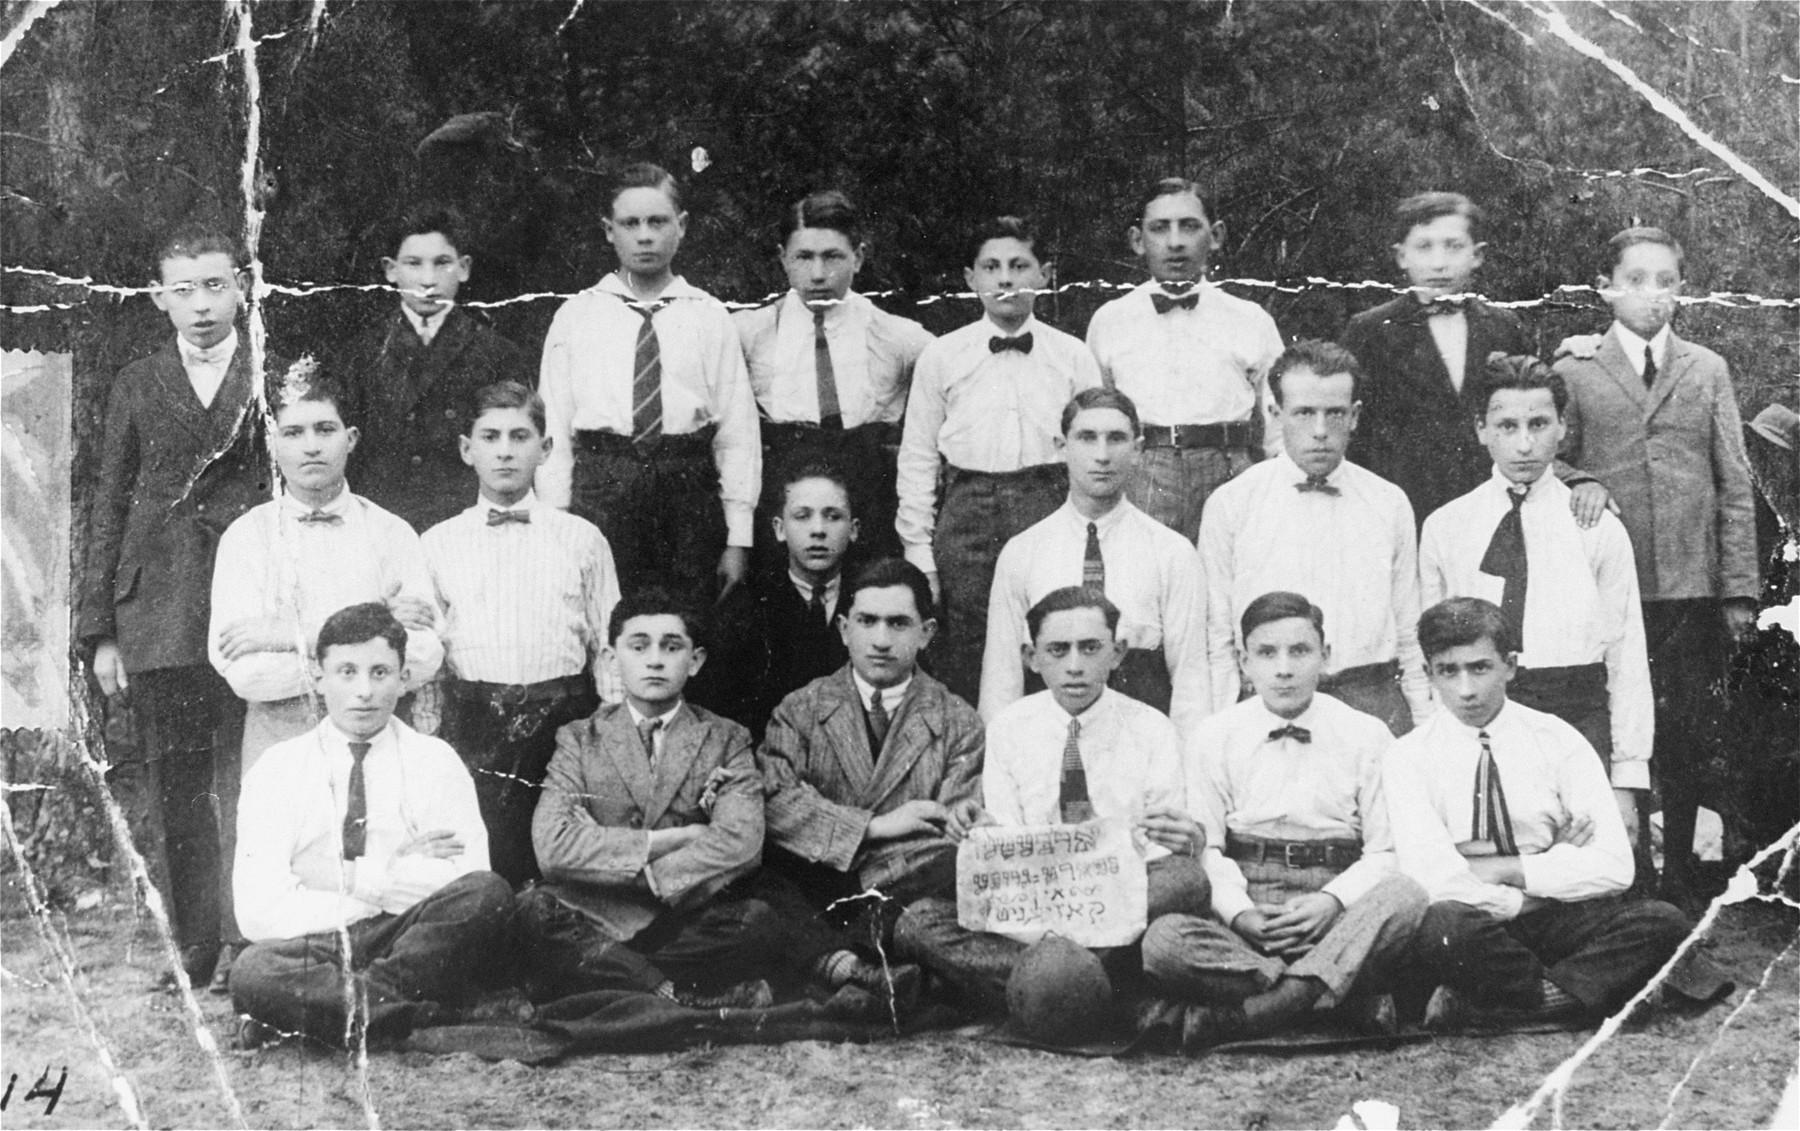 "Group portrait of members of the Bund socialist youth movement in Kozienice.  The Yiddish sign reads: ""Workers' sports group in Kozienice.""  Among those pictured are: Shlomo Huberman, Matl Steinboim, Israel Herman, Moshe Kahan, Shalom Blaunis, Daniel Weinberg, Yankel Weinberg, Gedalia Weinberg, Michael Rogal, Ezra Arbeitman, Chaim Hartman, Leibush Zaterman and Binem Provisor."